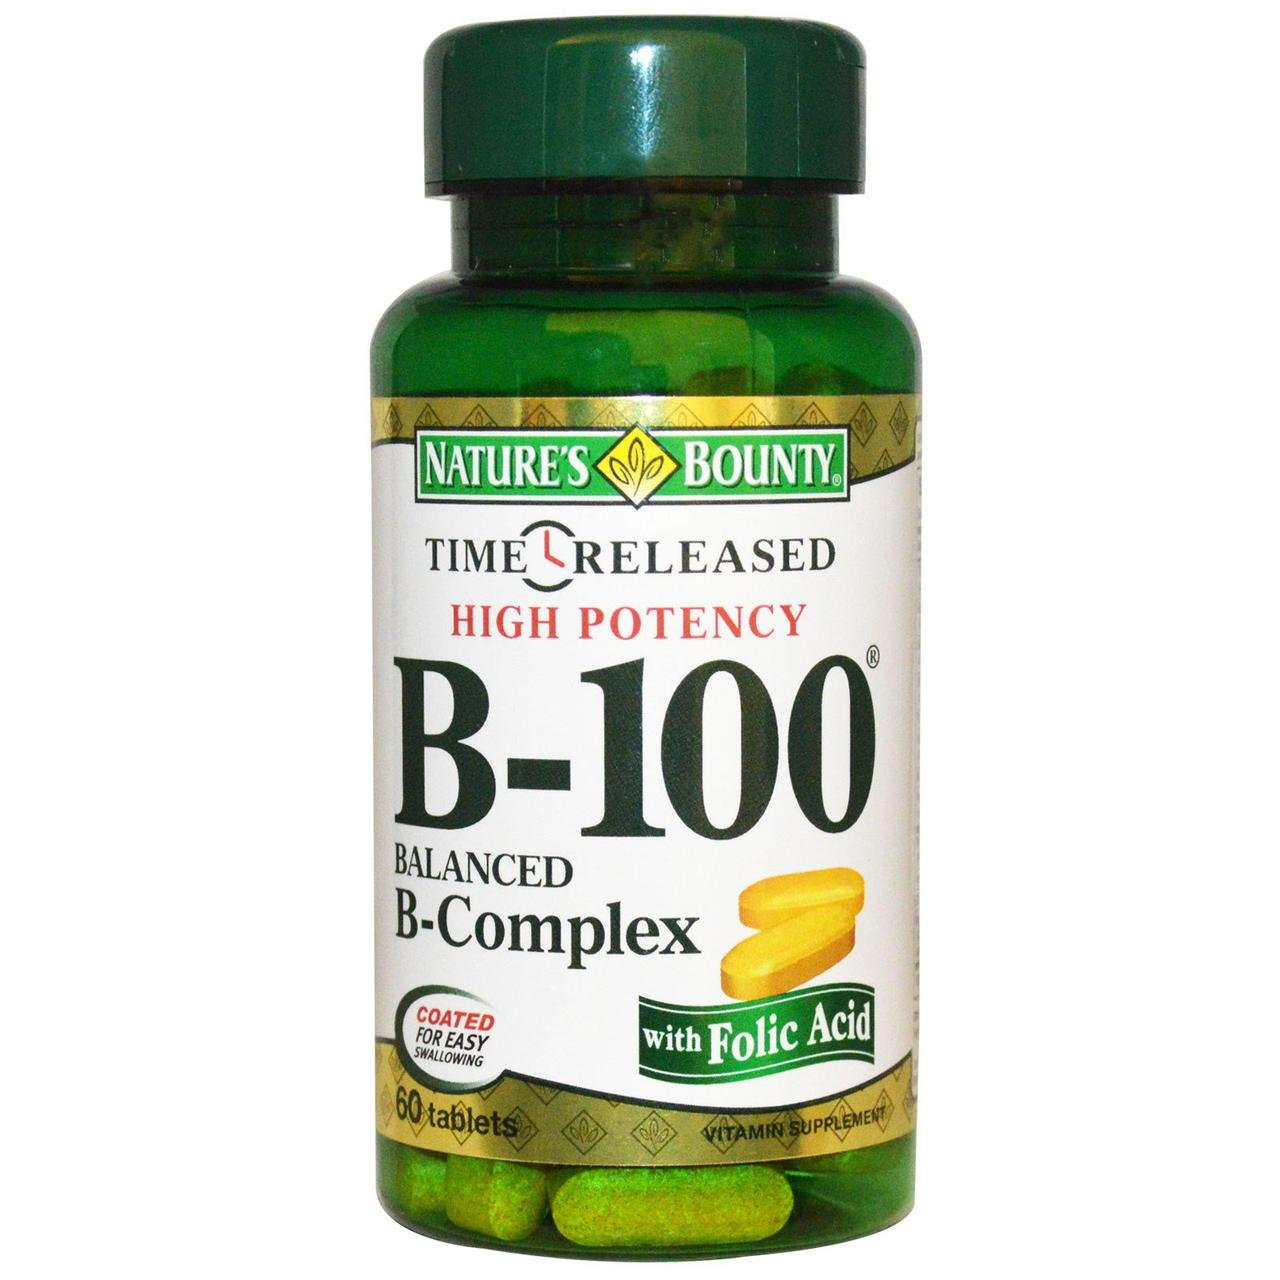 Nature's Bounty, B-100, High Potency, 60 Tablets